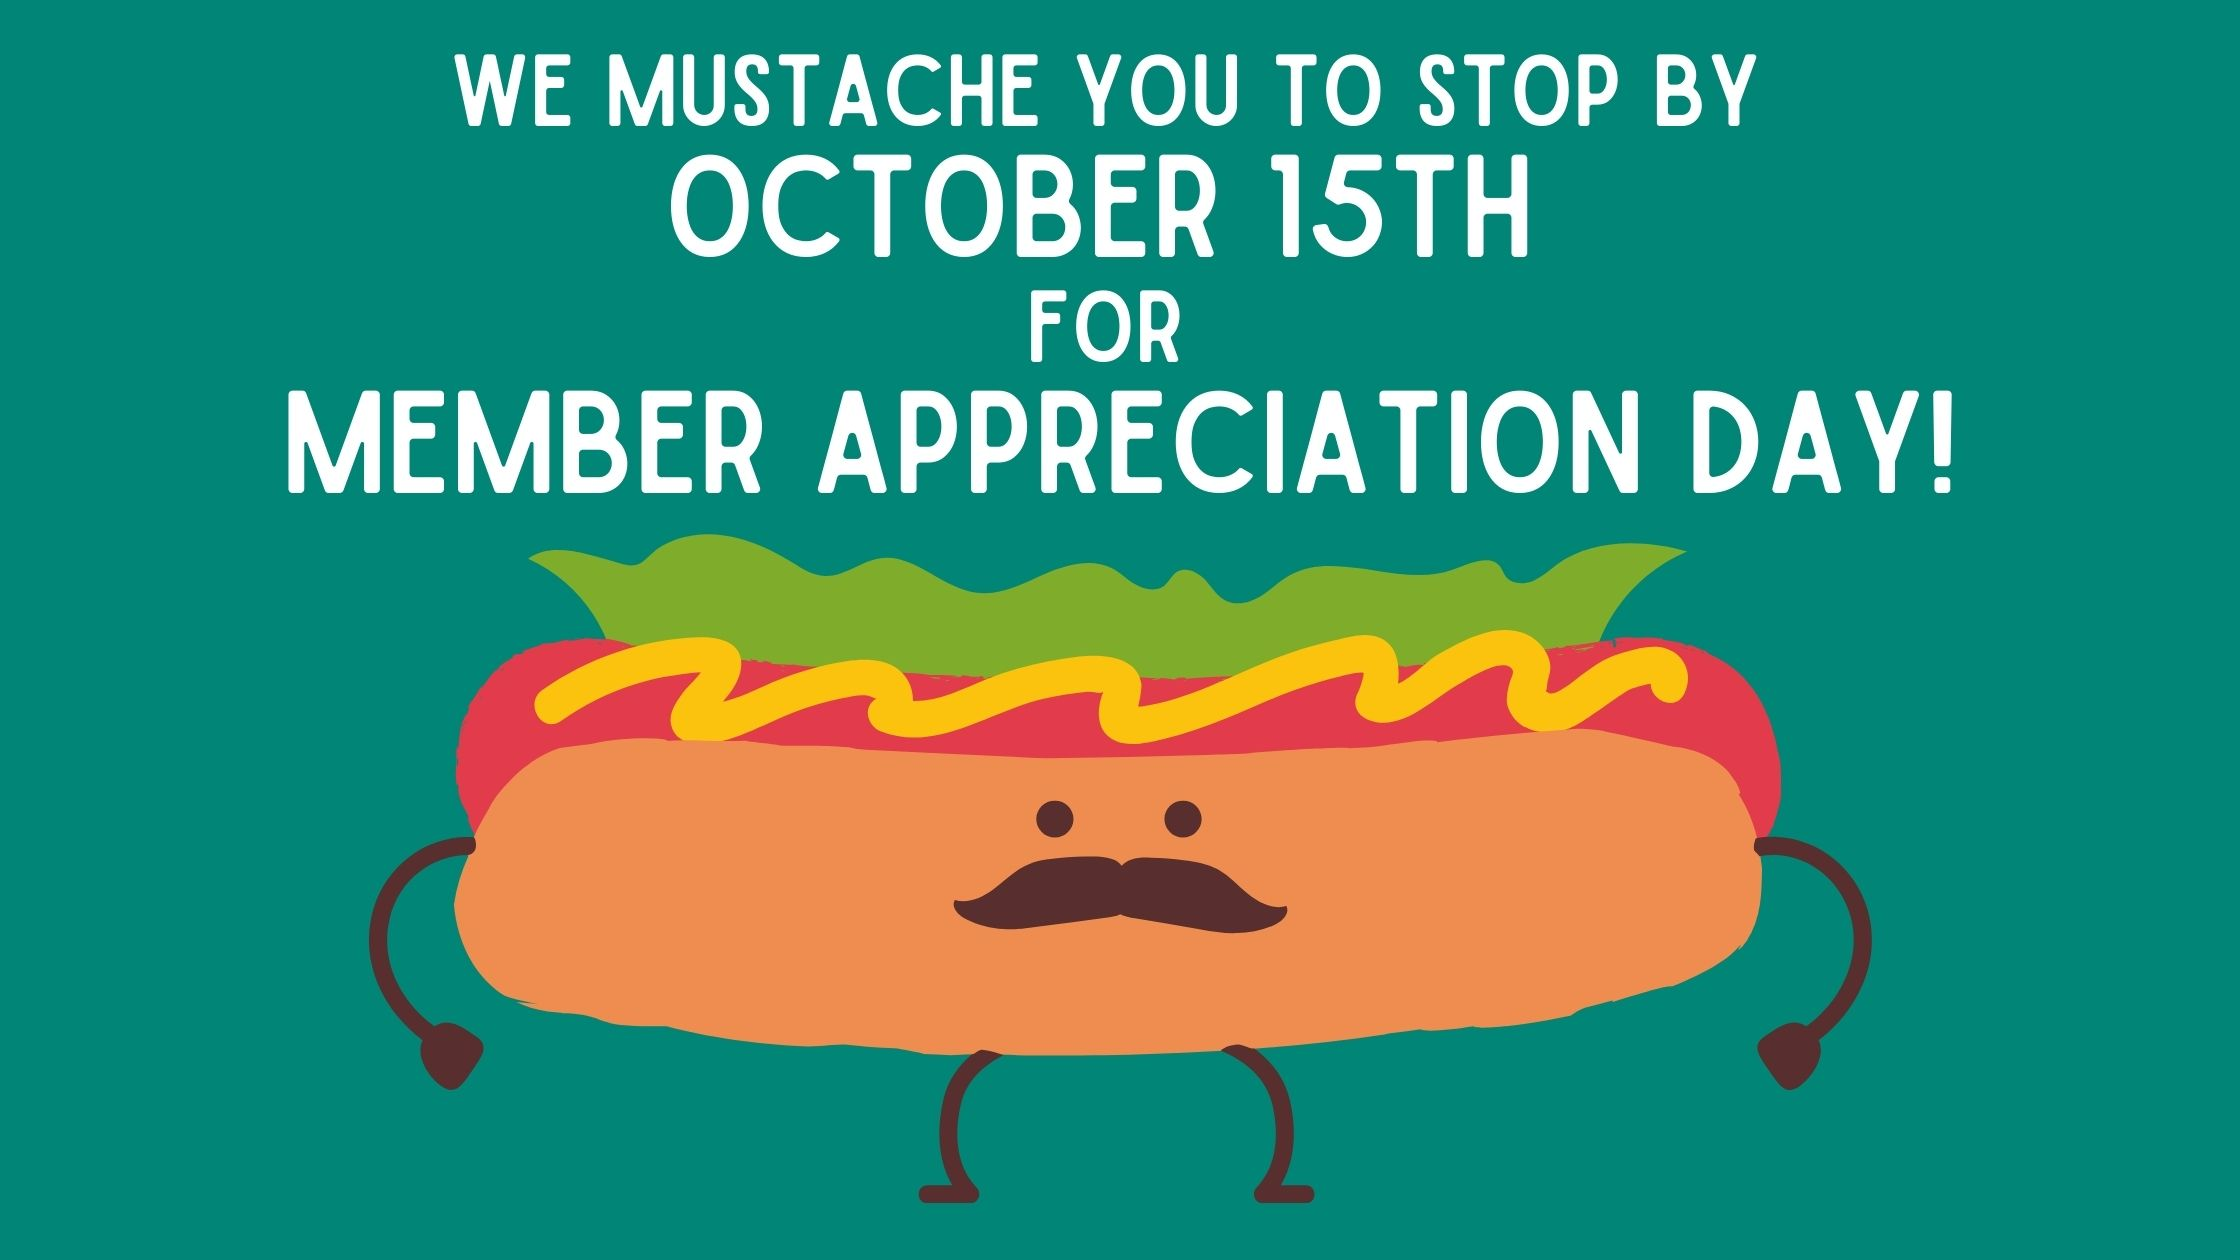 invite to member appreciation day on October 15th